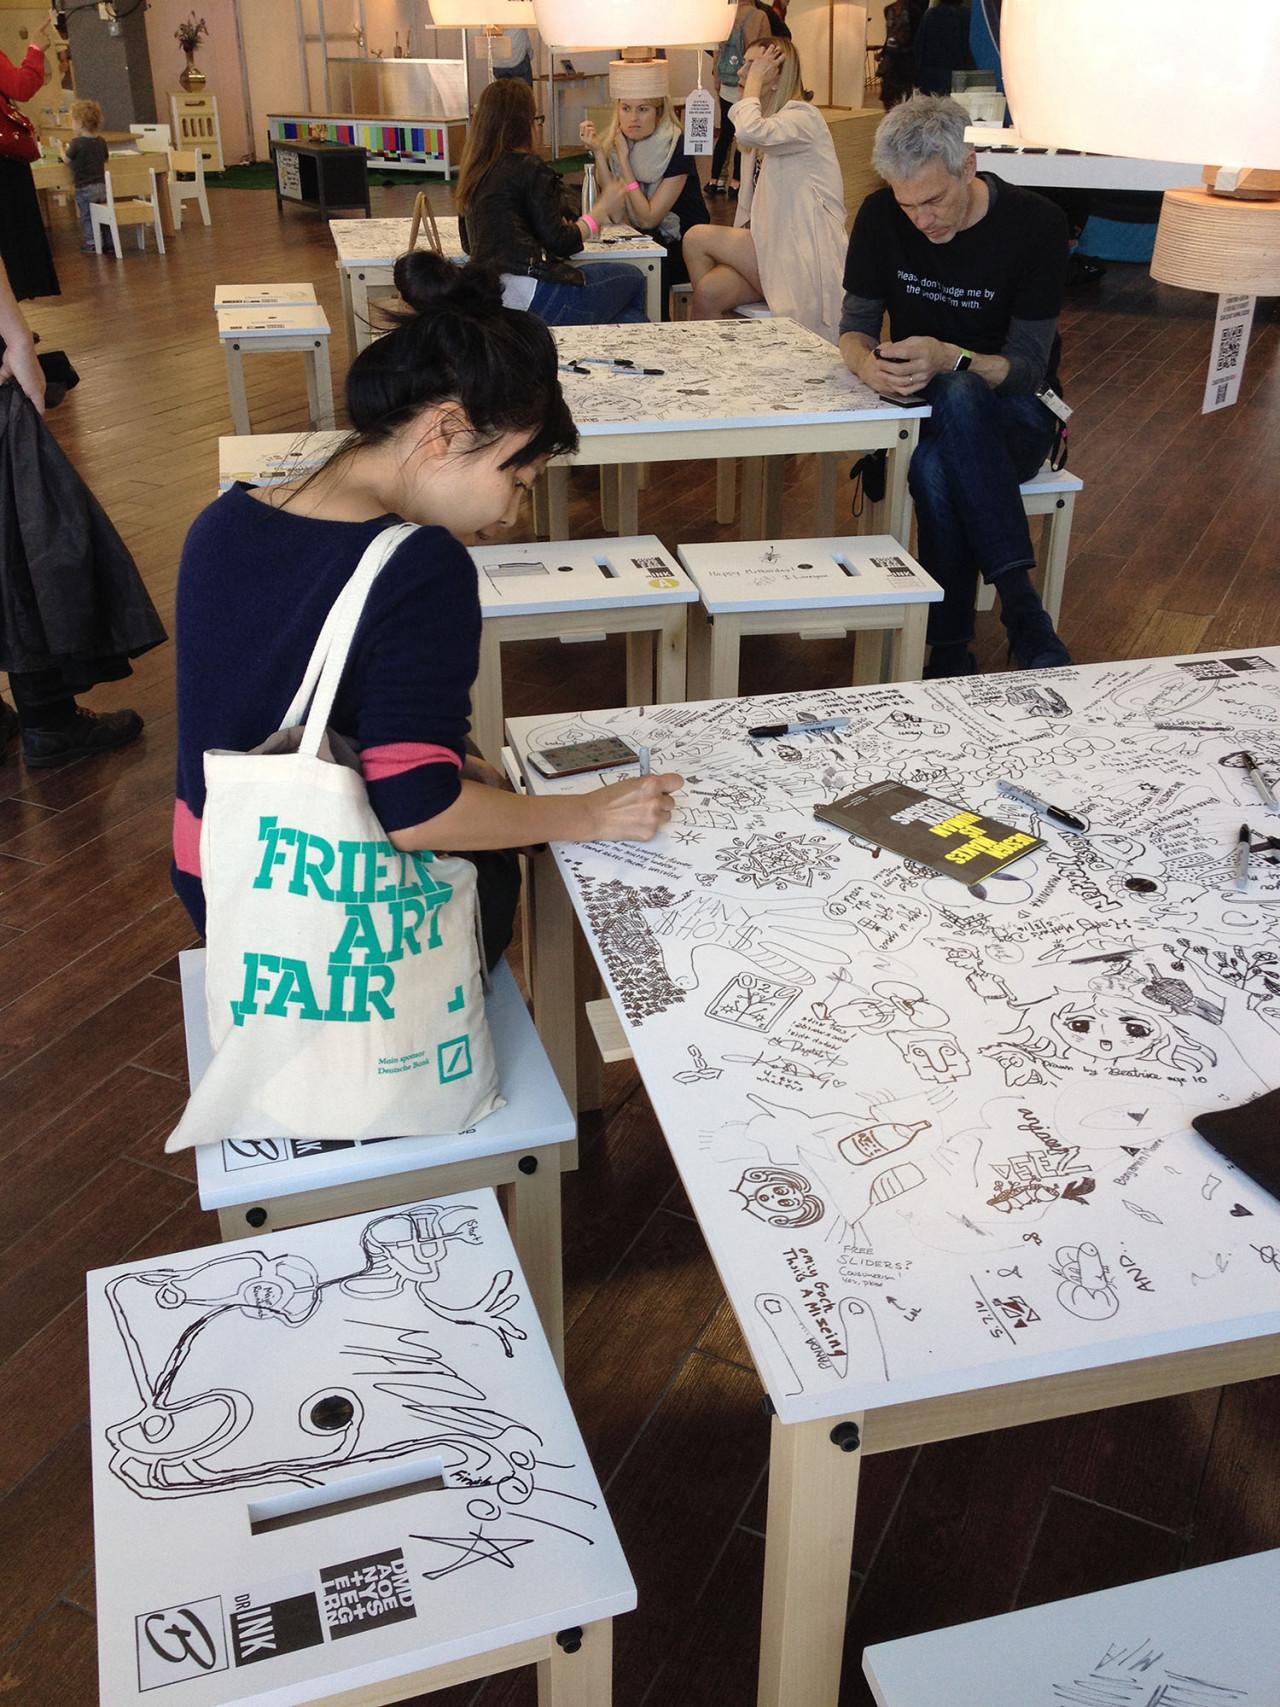 danielmoyerdesign Encourages Drawing on Furniture